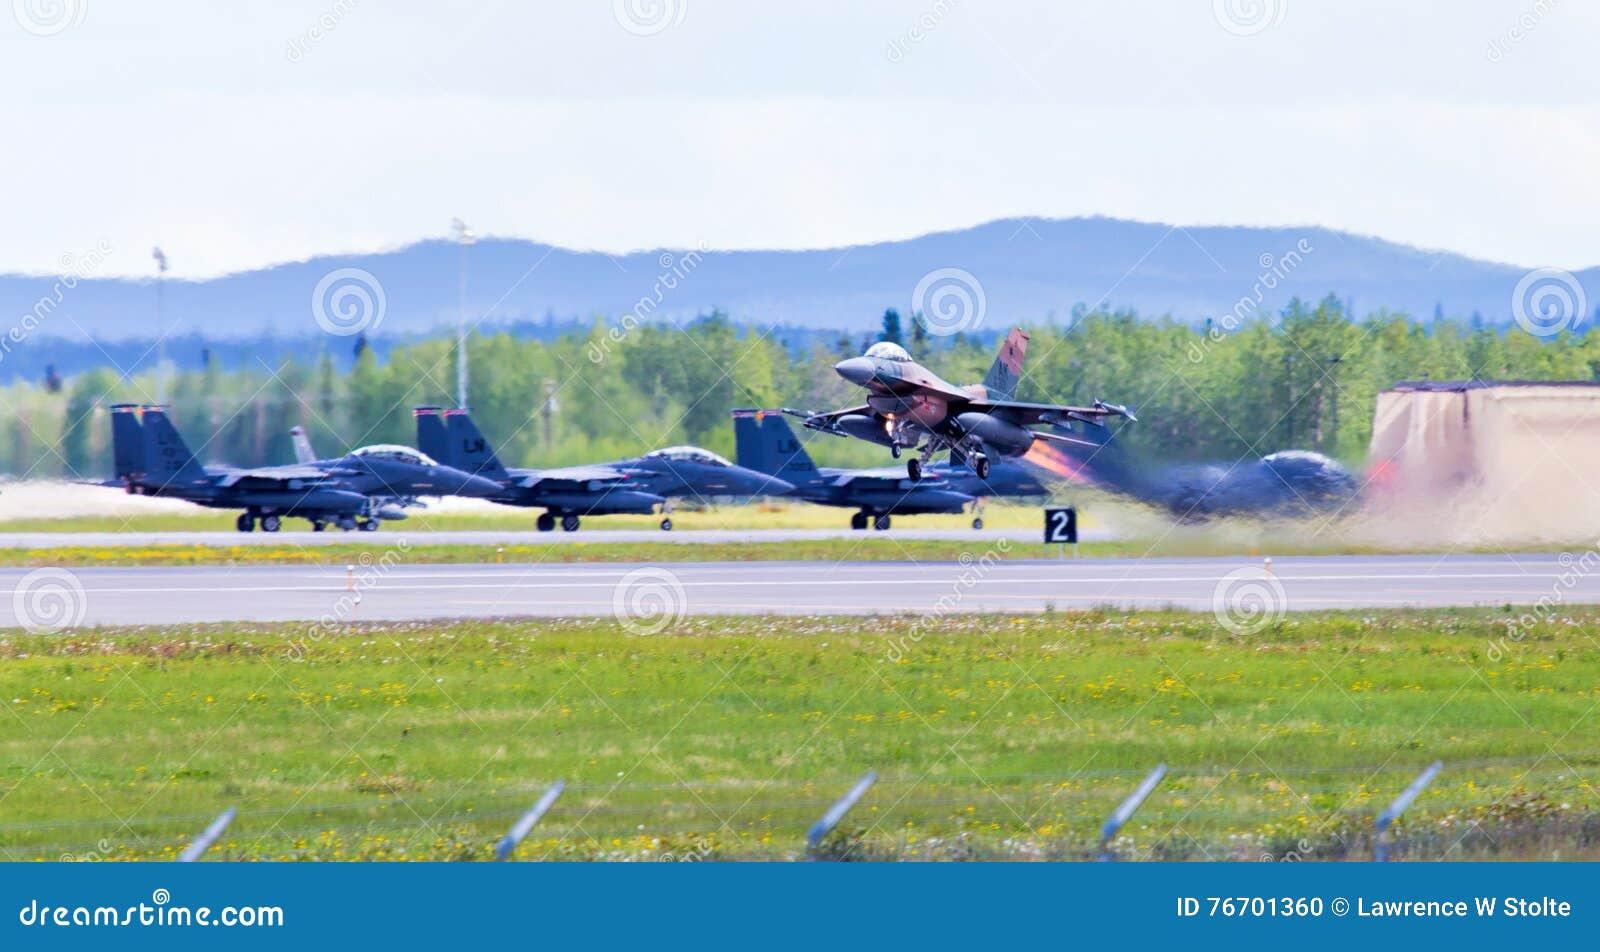 Jet Taking Off #1